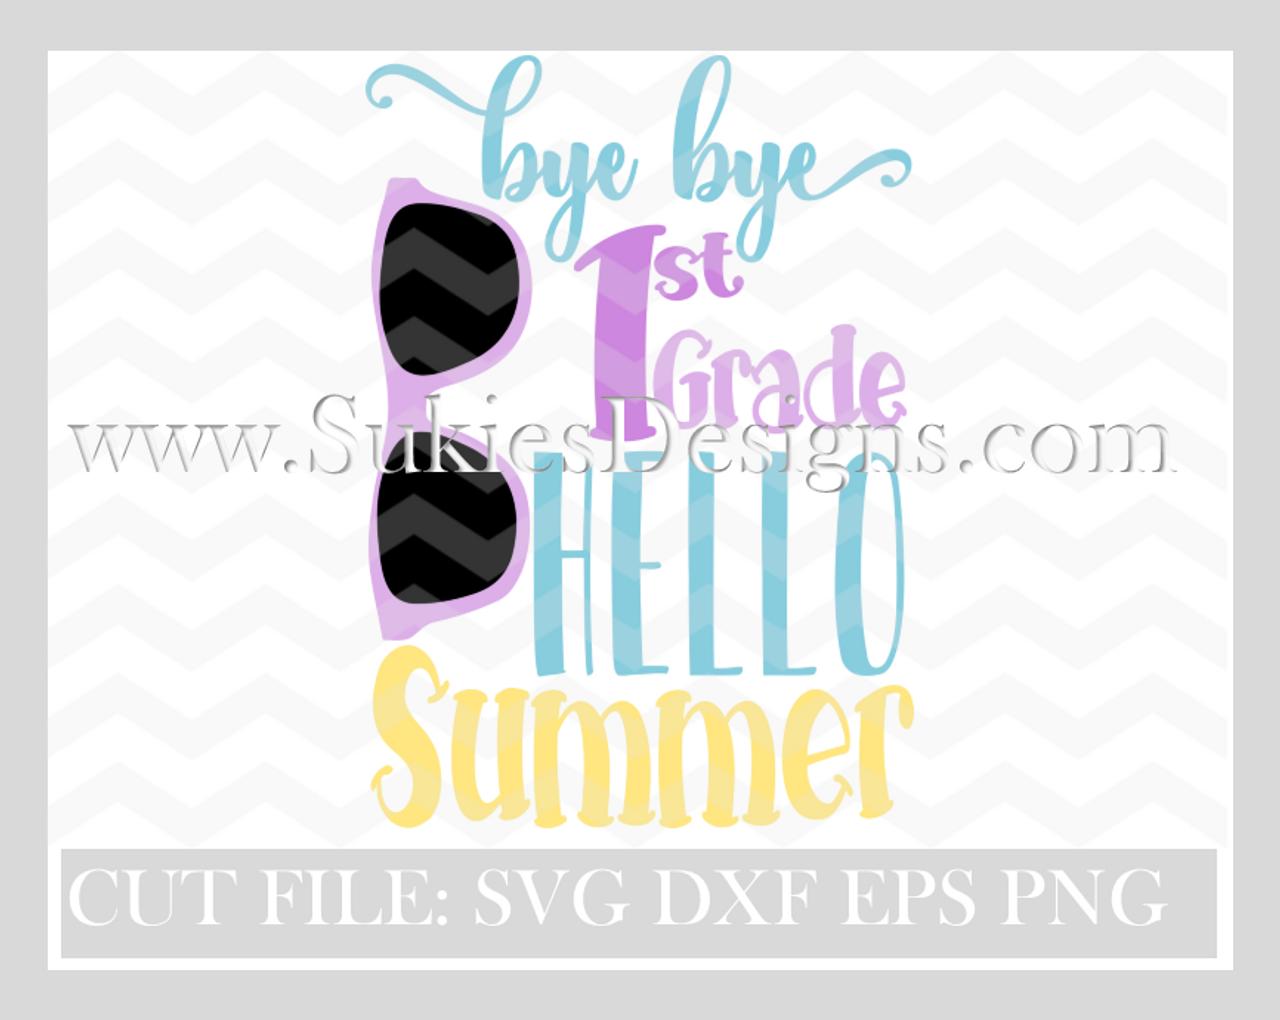 Bye bye 1st grade Hello Summer SVG, DXF, PNG EPS